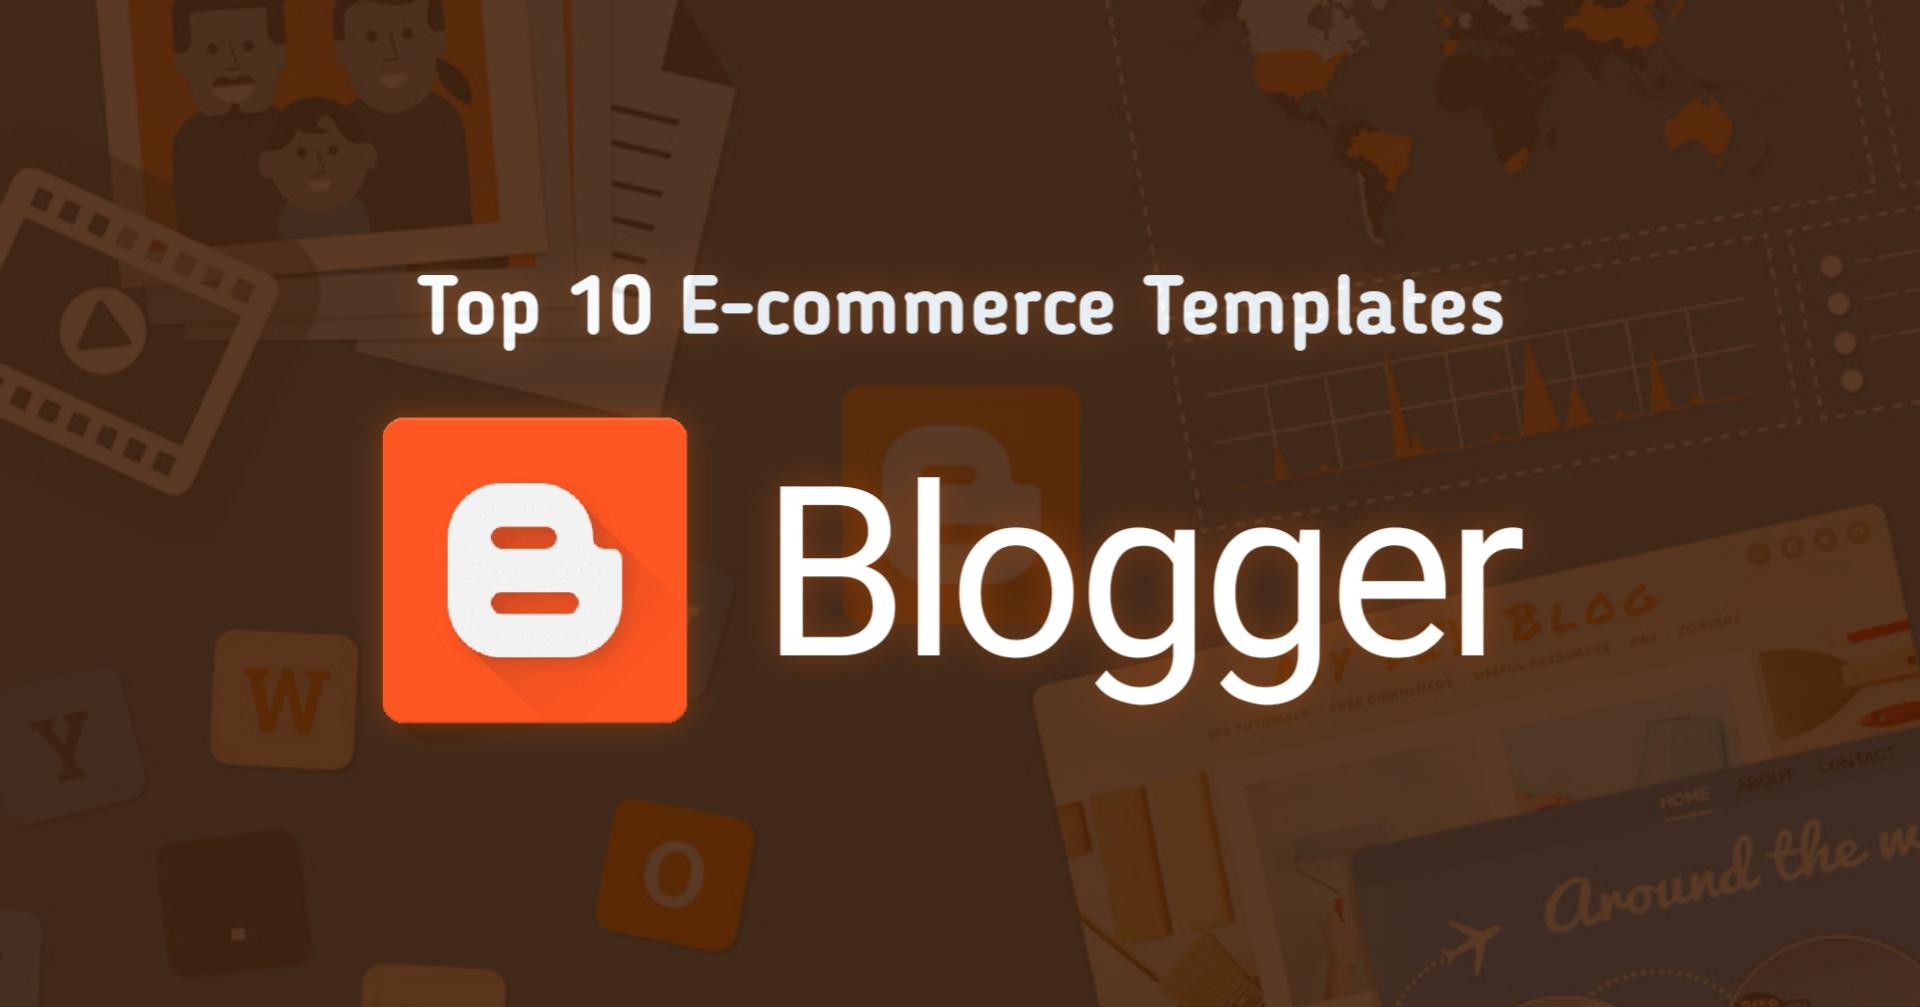 Top 10 E-commerce Blogger Templates